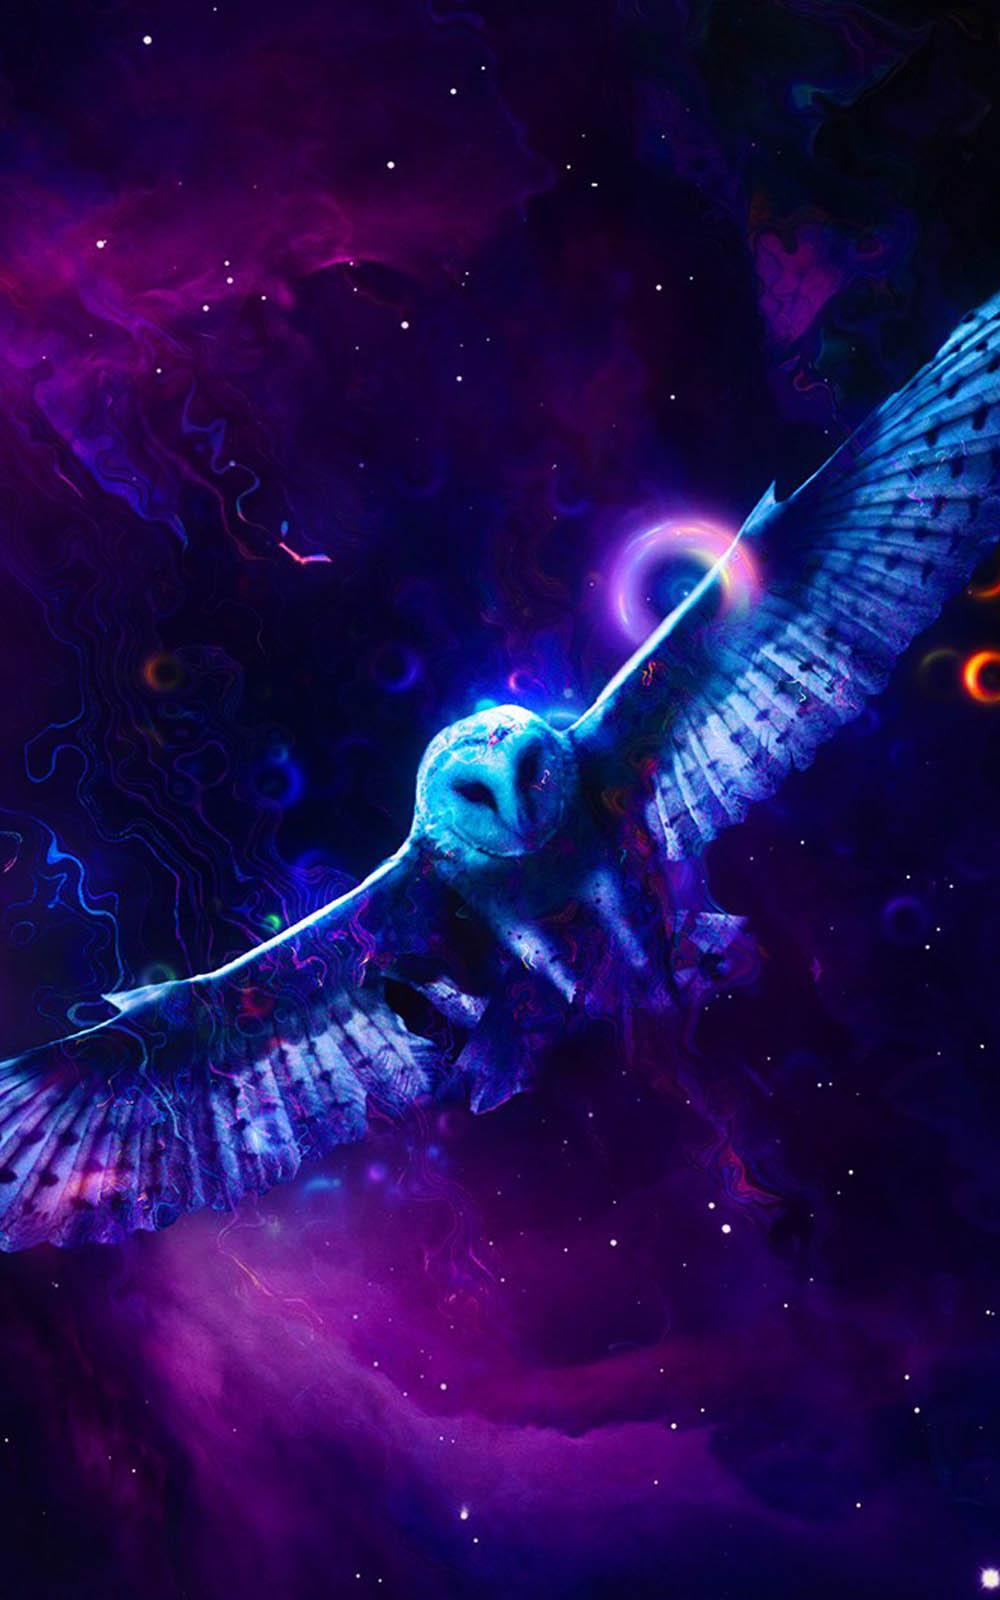 Download neon owl free pure 4k ultra hd mobile wallpaper - Neon hd wallpaper for mobile ...